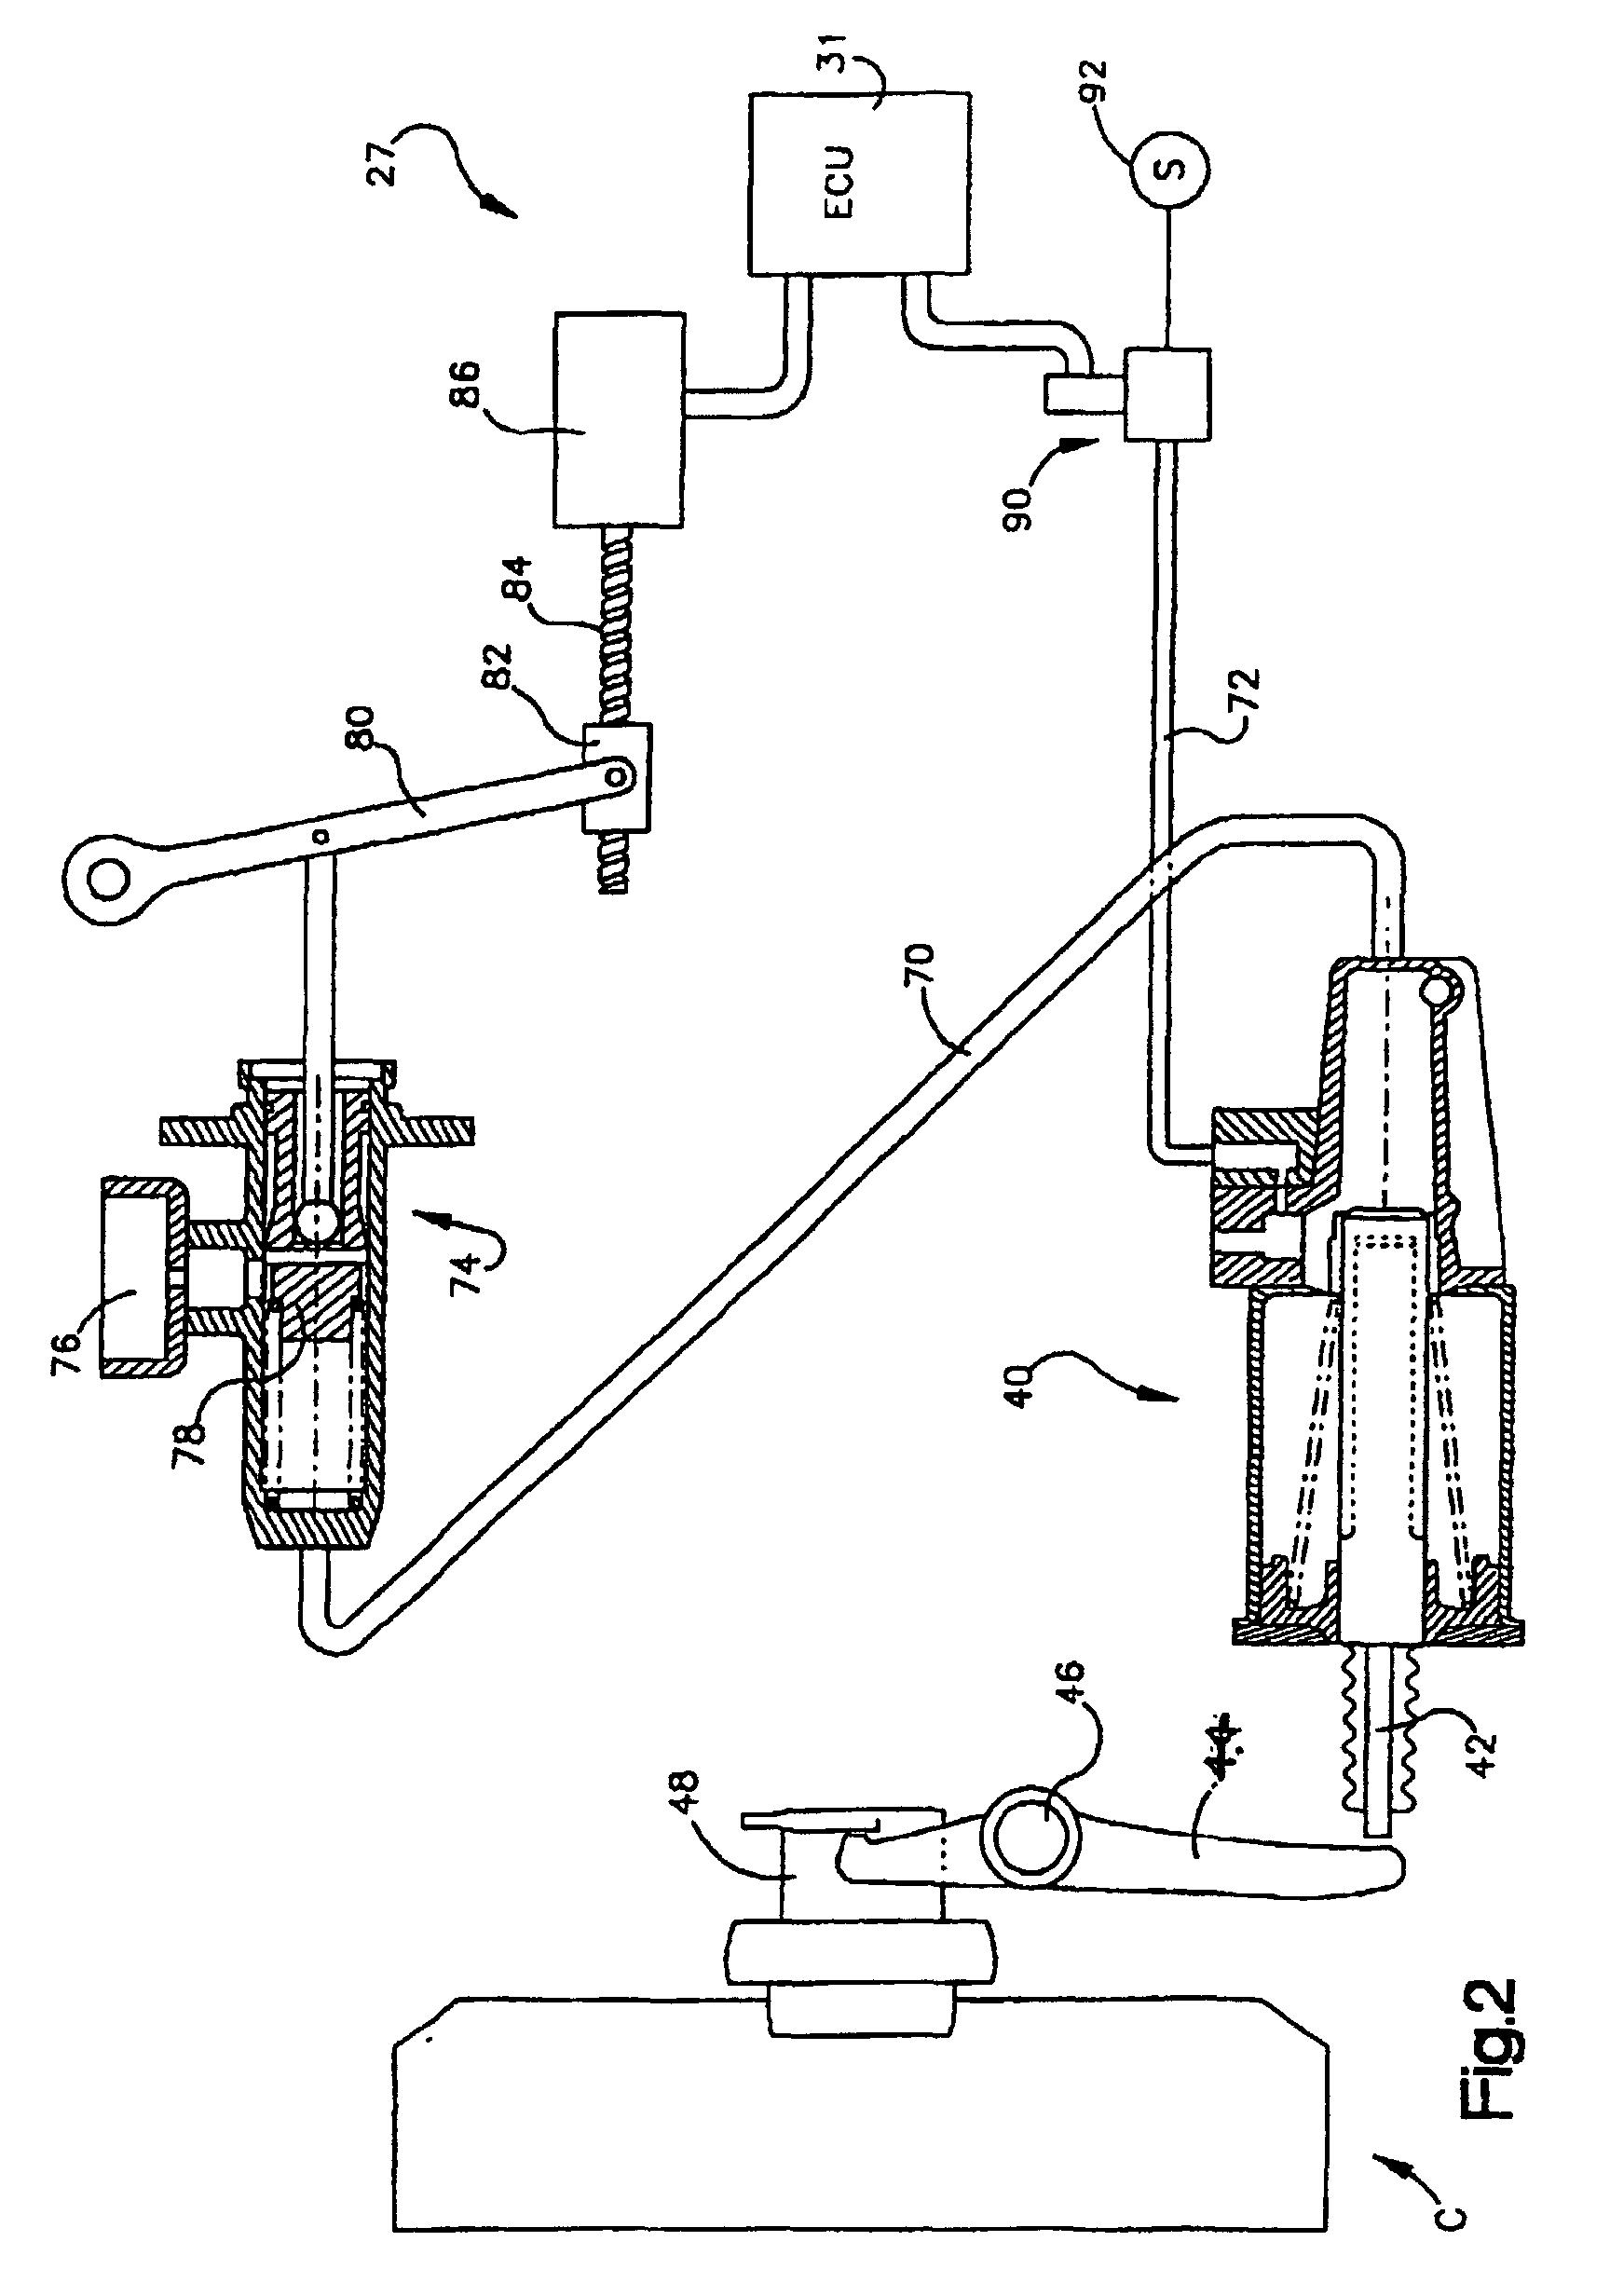 Patent Ep0834669b1